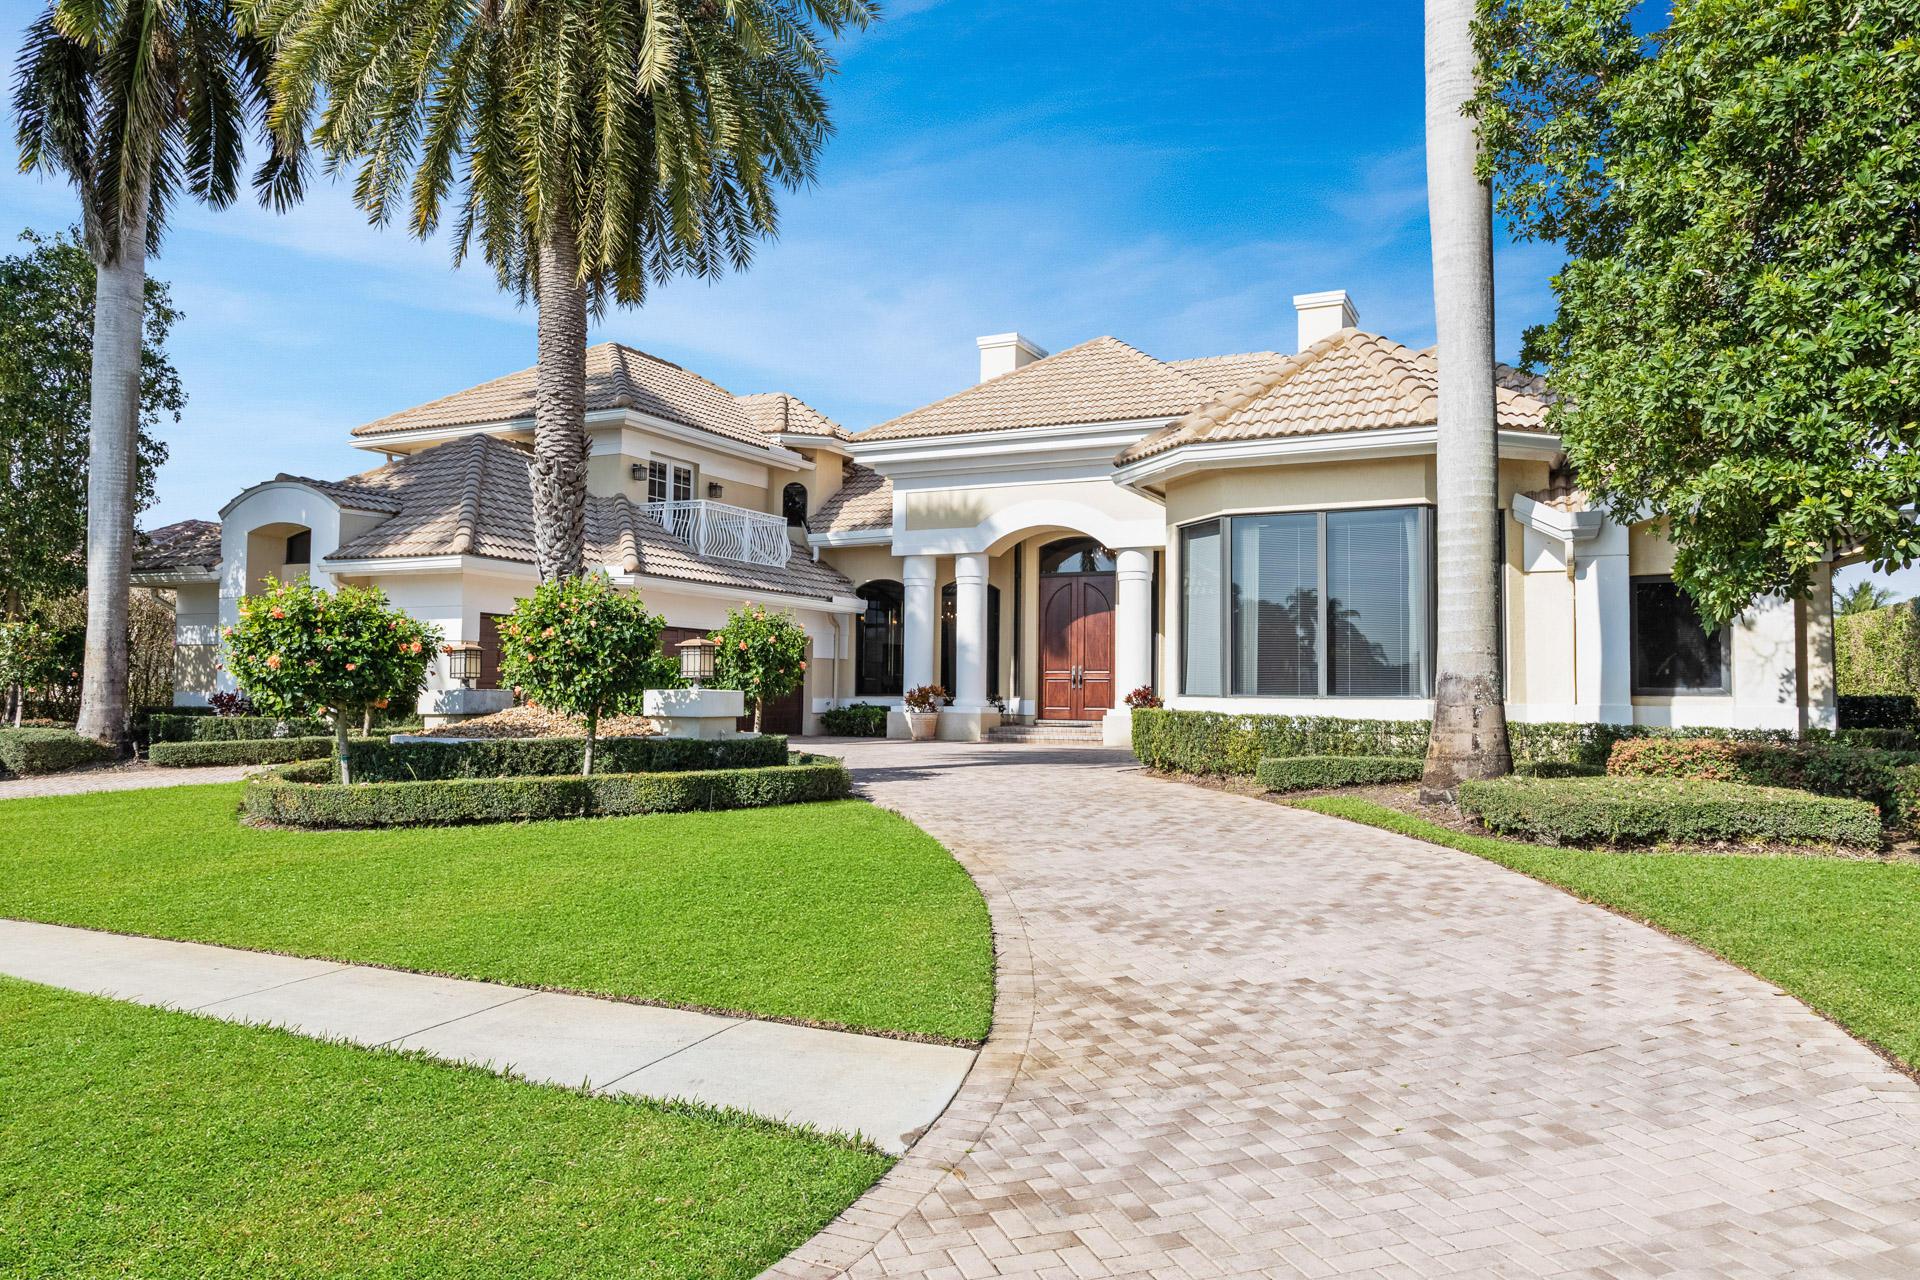 4451 Bocaire Boulevard, Boca Raton, Florida 33487, 4 Bedrooms Bedrooms, ,6.1 BathroomsBathrooms,Single Family,For Sale,Bocaire,RX-10496728